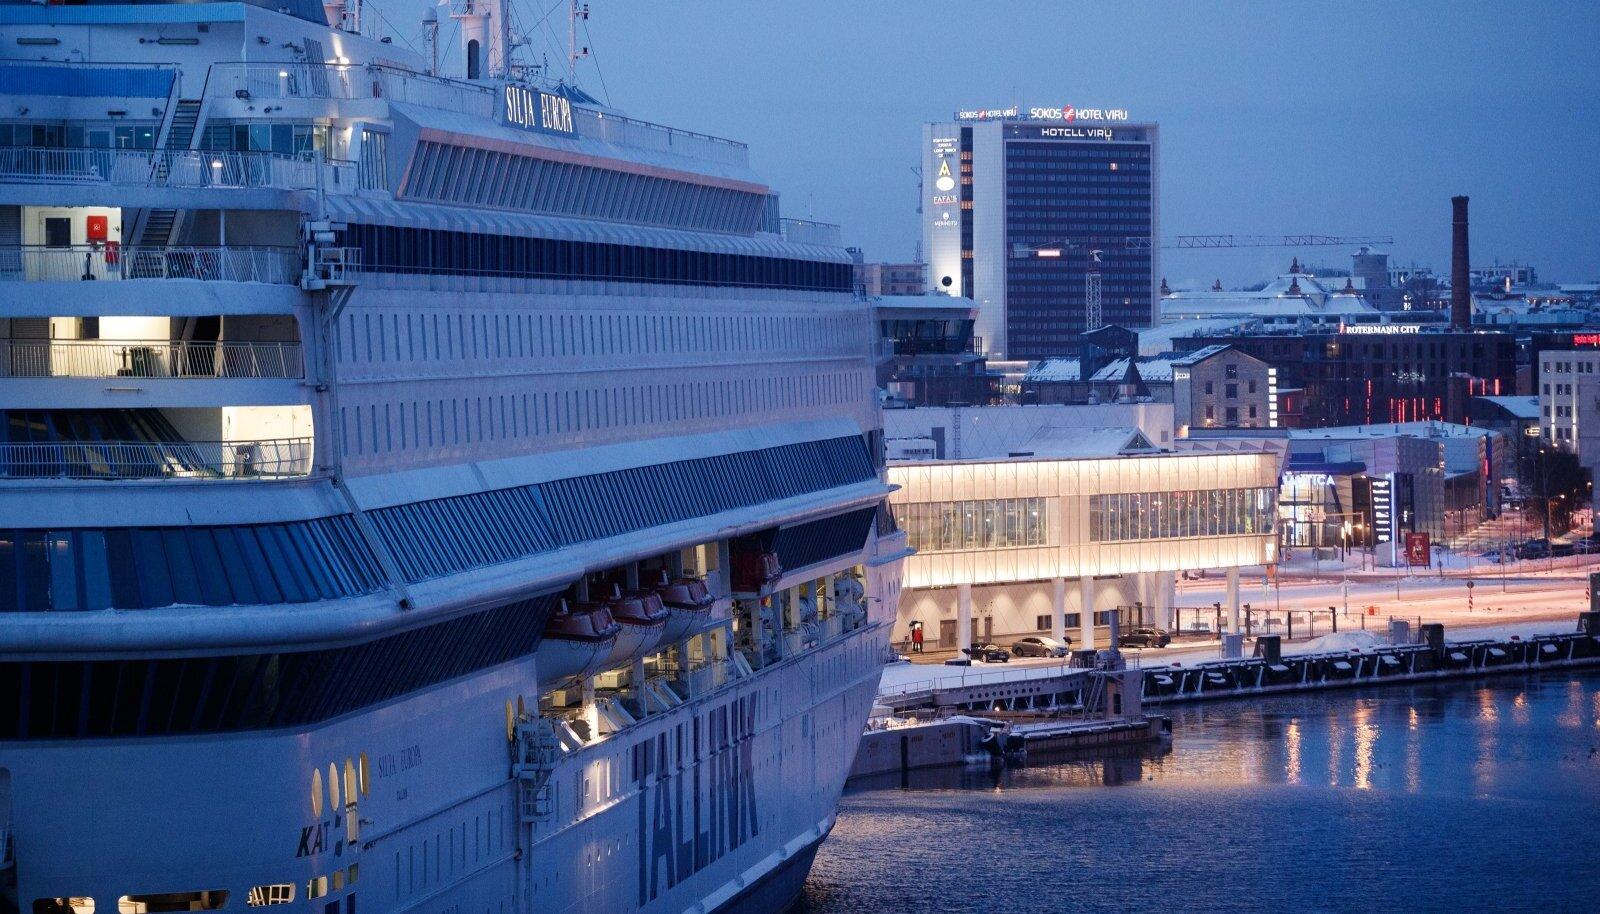 Tallinki laev ja Viru hotell